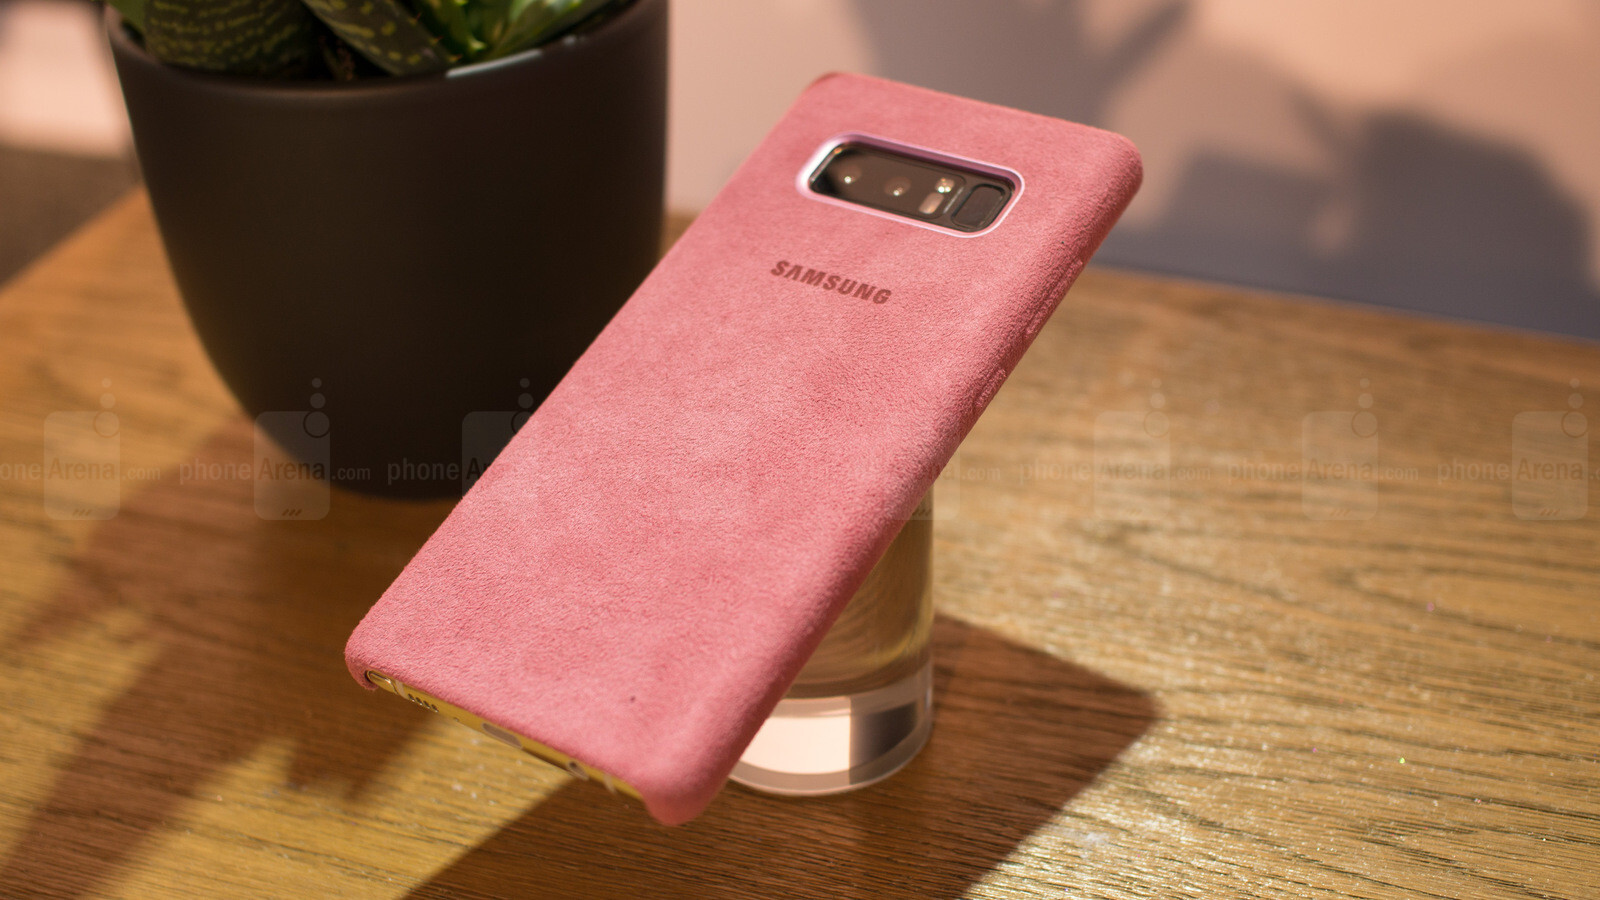 best service 7d1c3 c17dd Official Samsung Galaxy Note 8 Alcantara case hands-on | PhoneArena ...